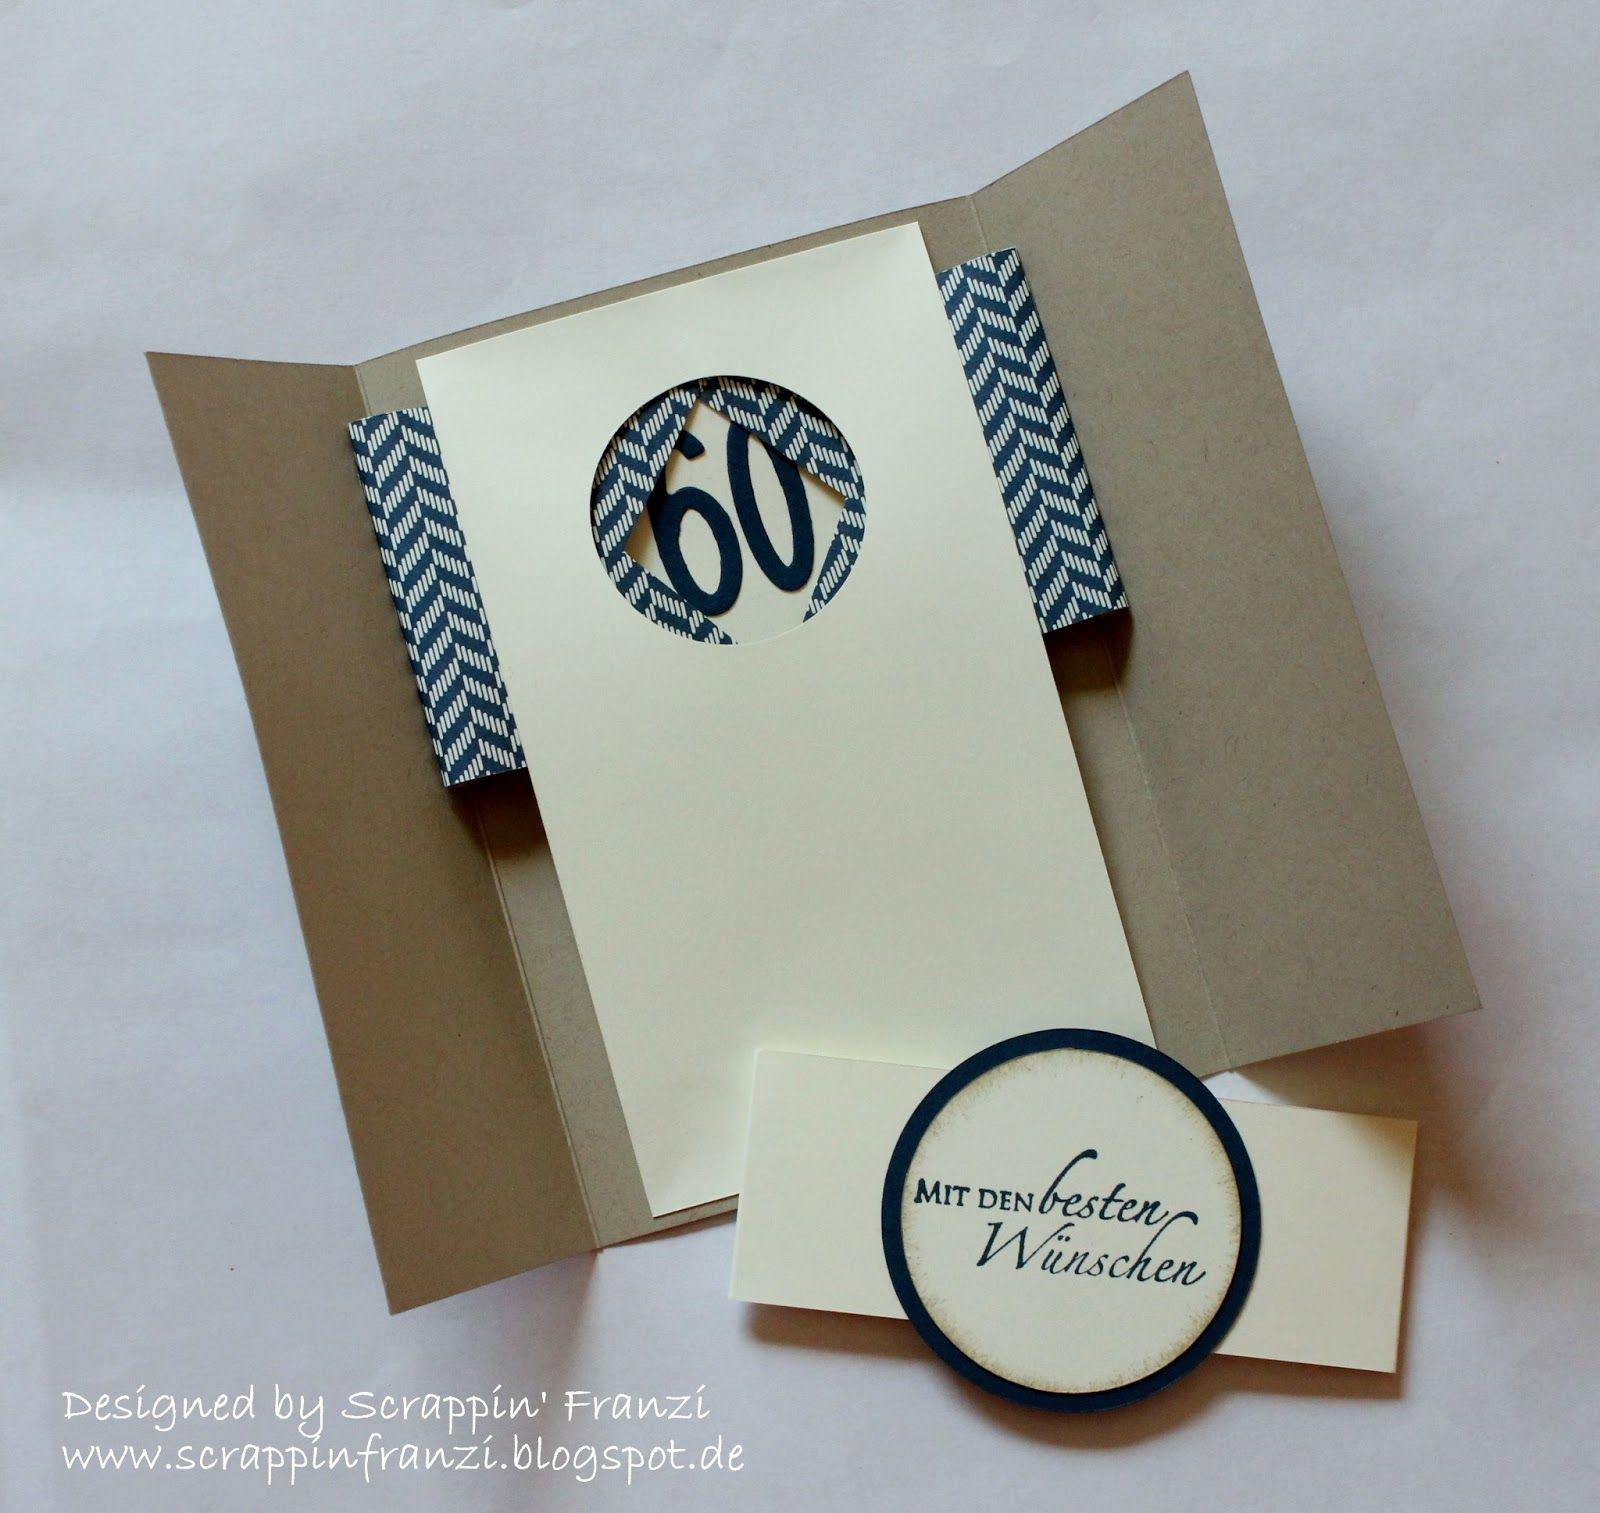 Scrappin' Franzi: Shutter Peek-a-boo Card